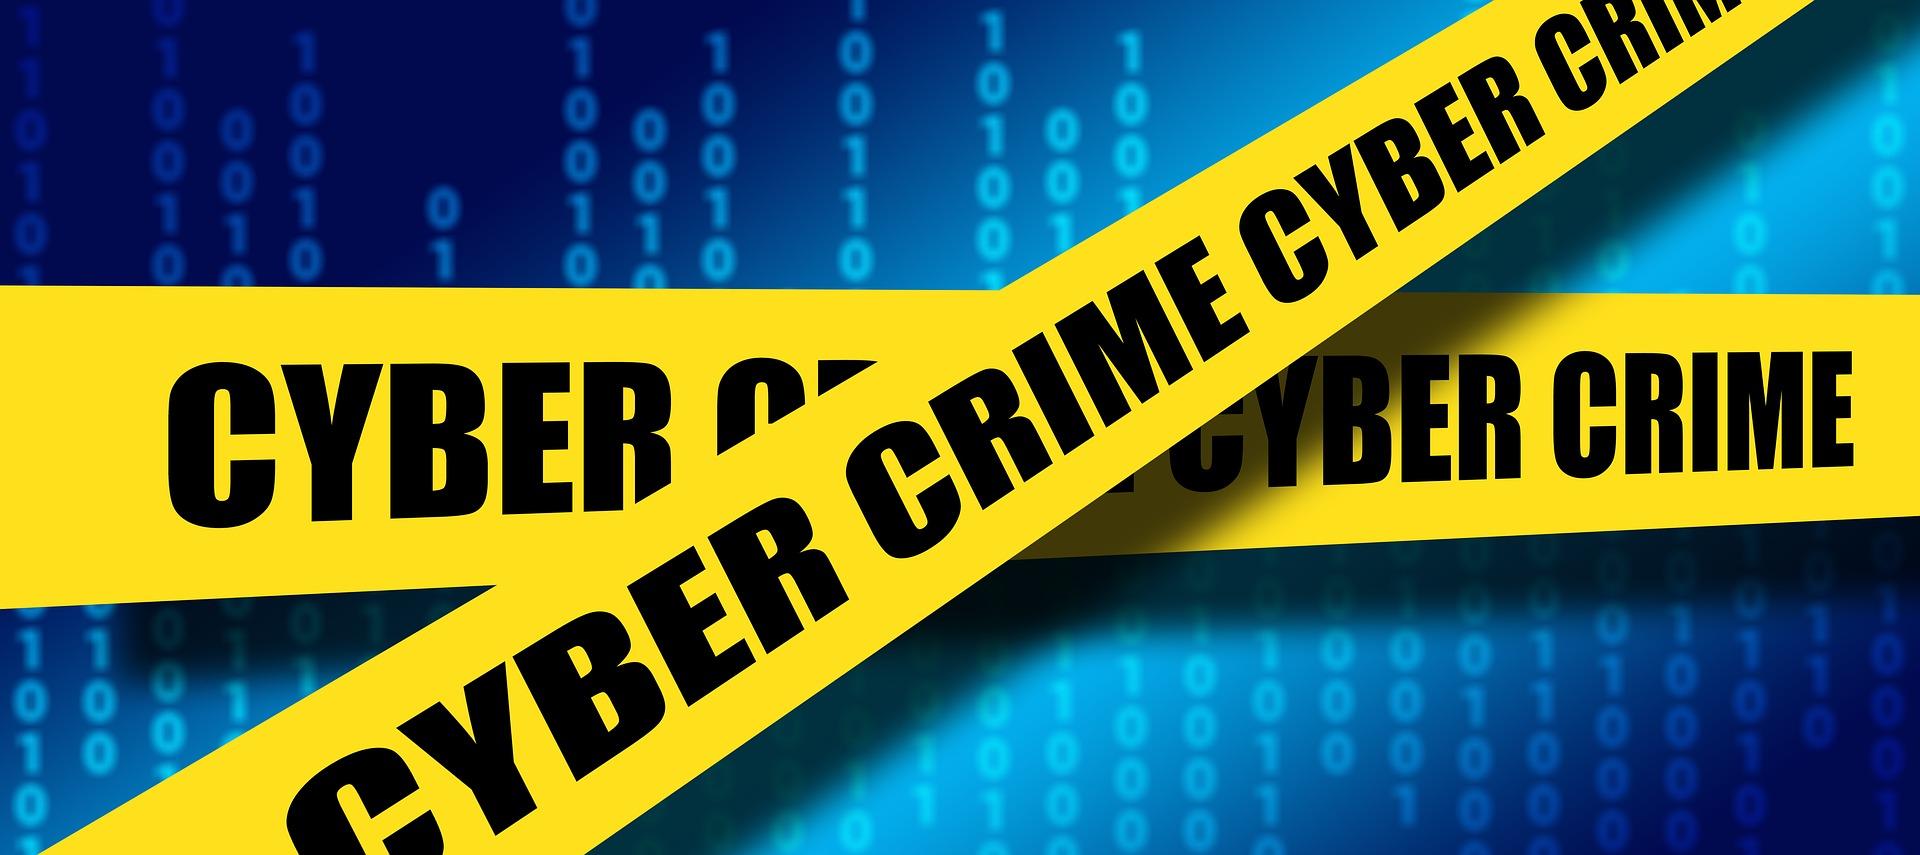 Cybercrime: Are you a CEO or CFO?